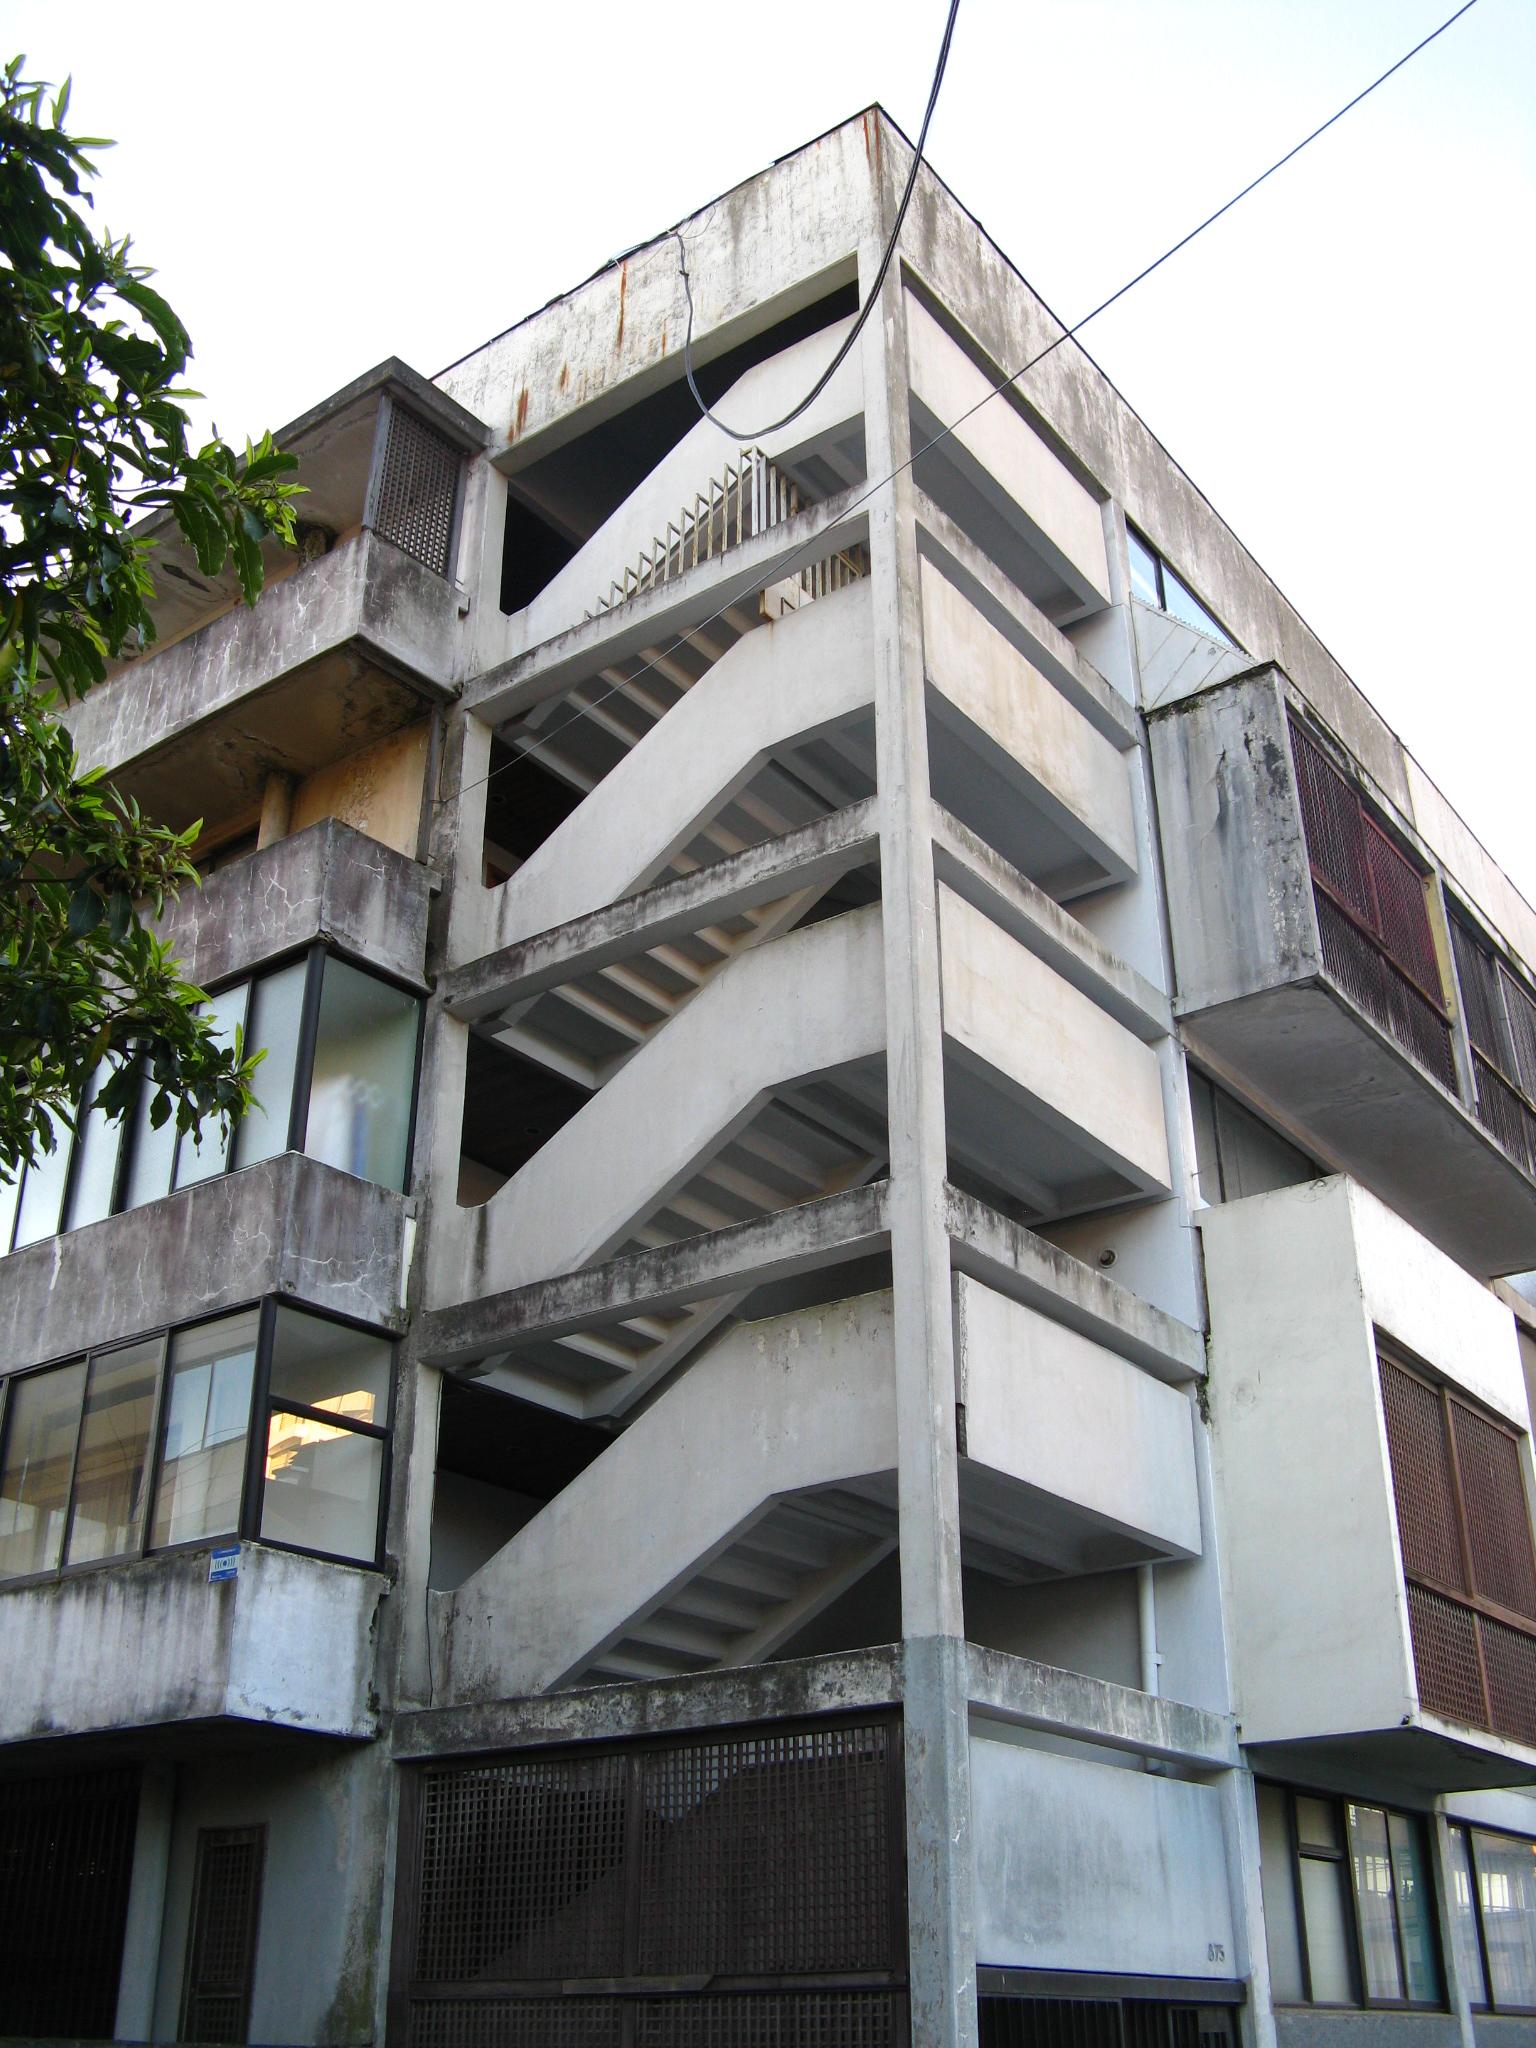 Arquitectura Casas Escaleras Exteriores Arquitectura: File:Edificio Arauco